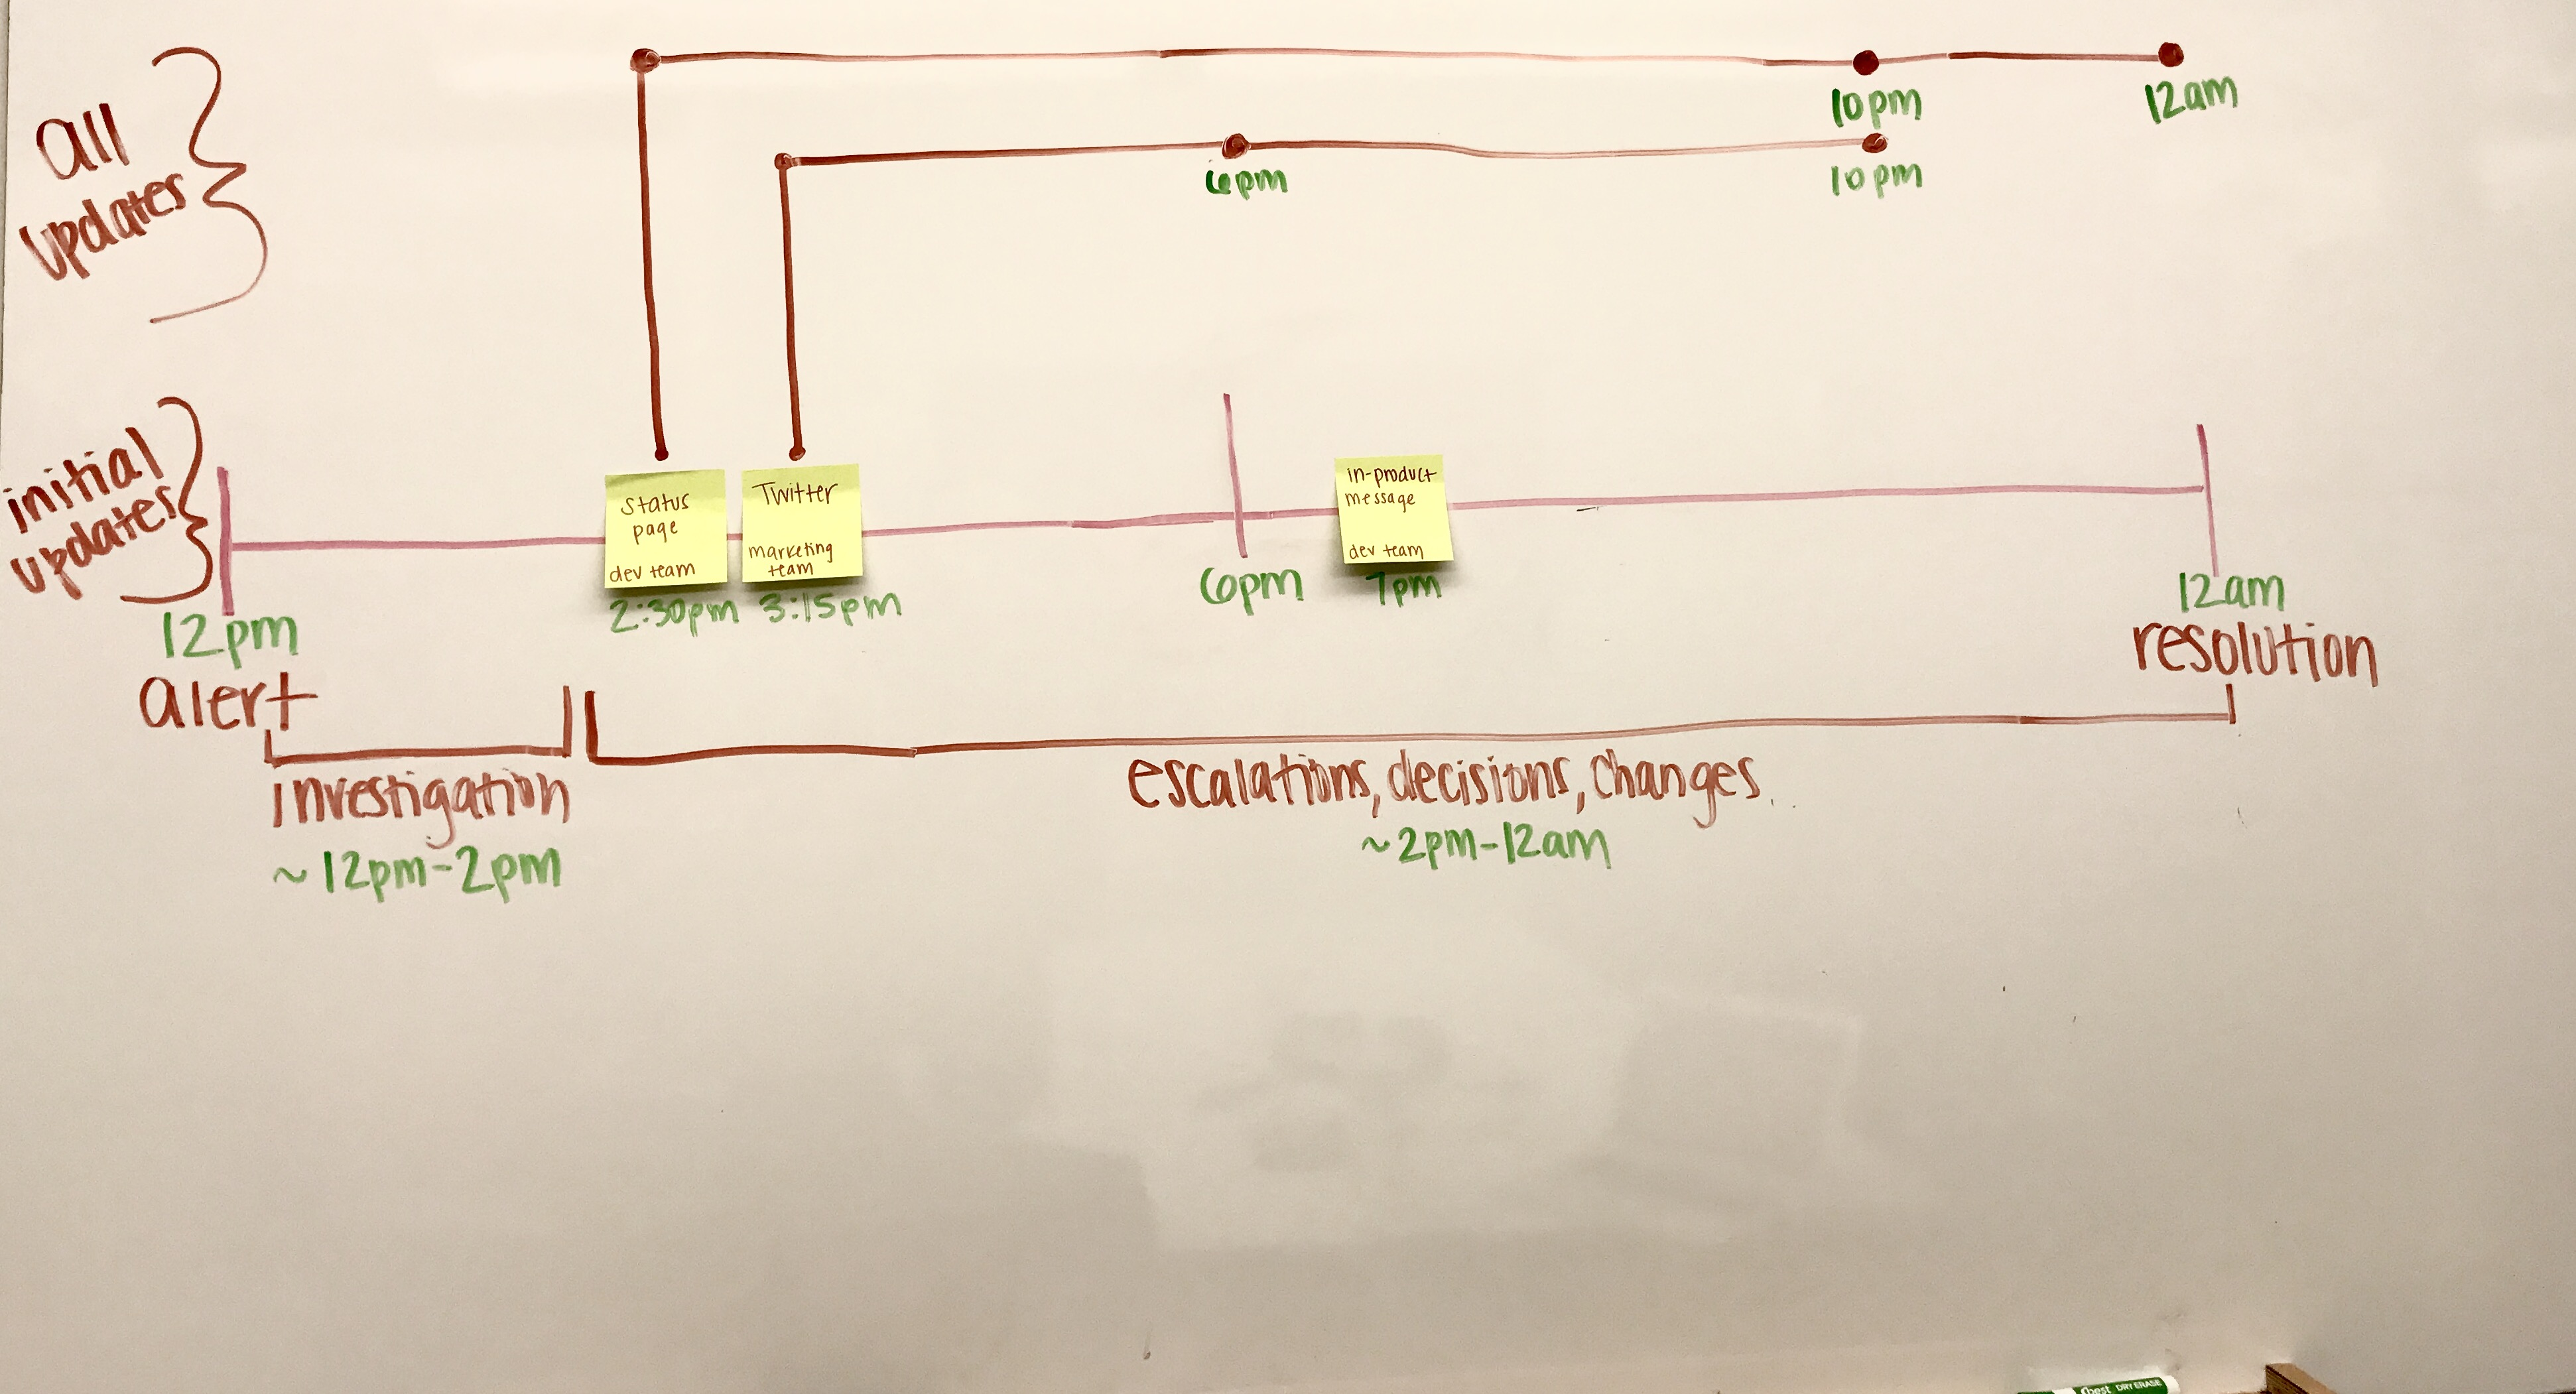 Incident response communications | Atlassian-Team-Playbook